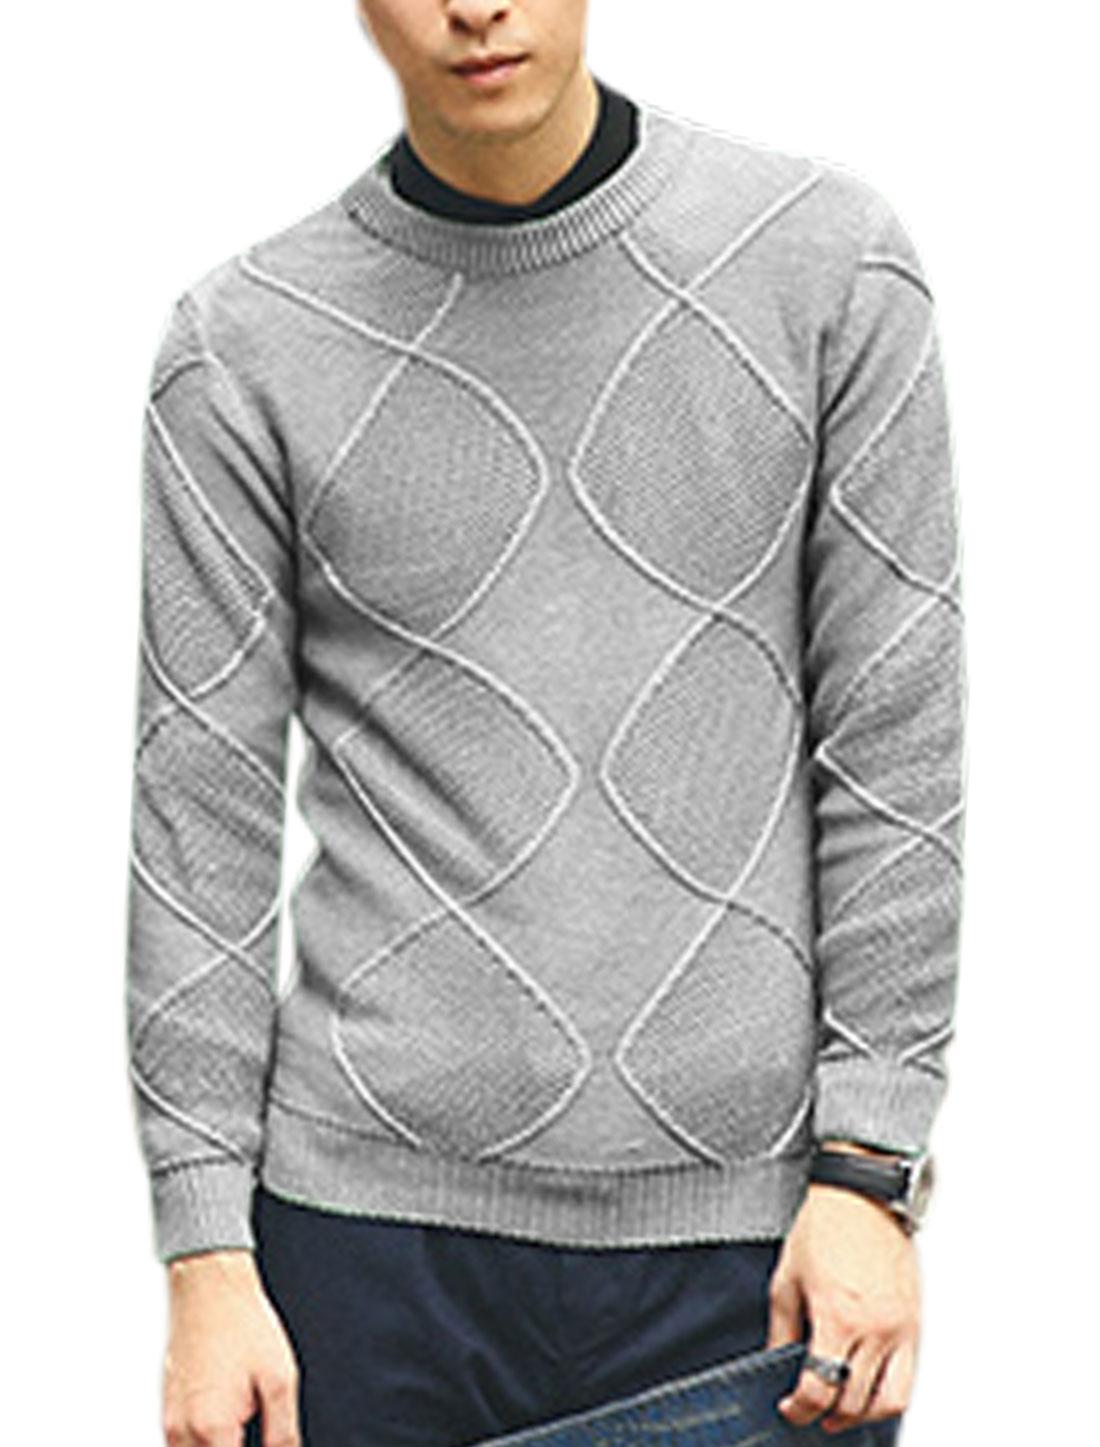 Men Crew Neck Argyle Design Ribbed Cuffs See Through Casual Sweater Light Gray M